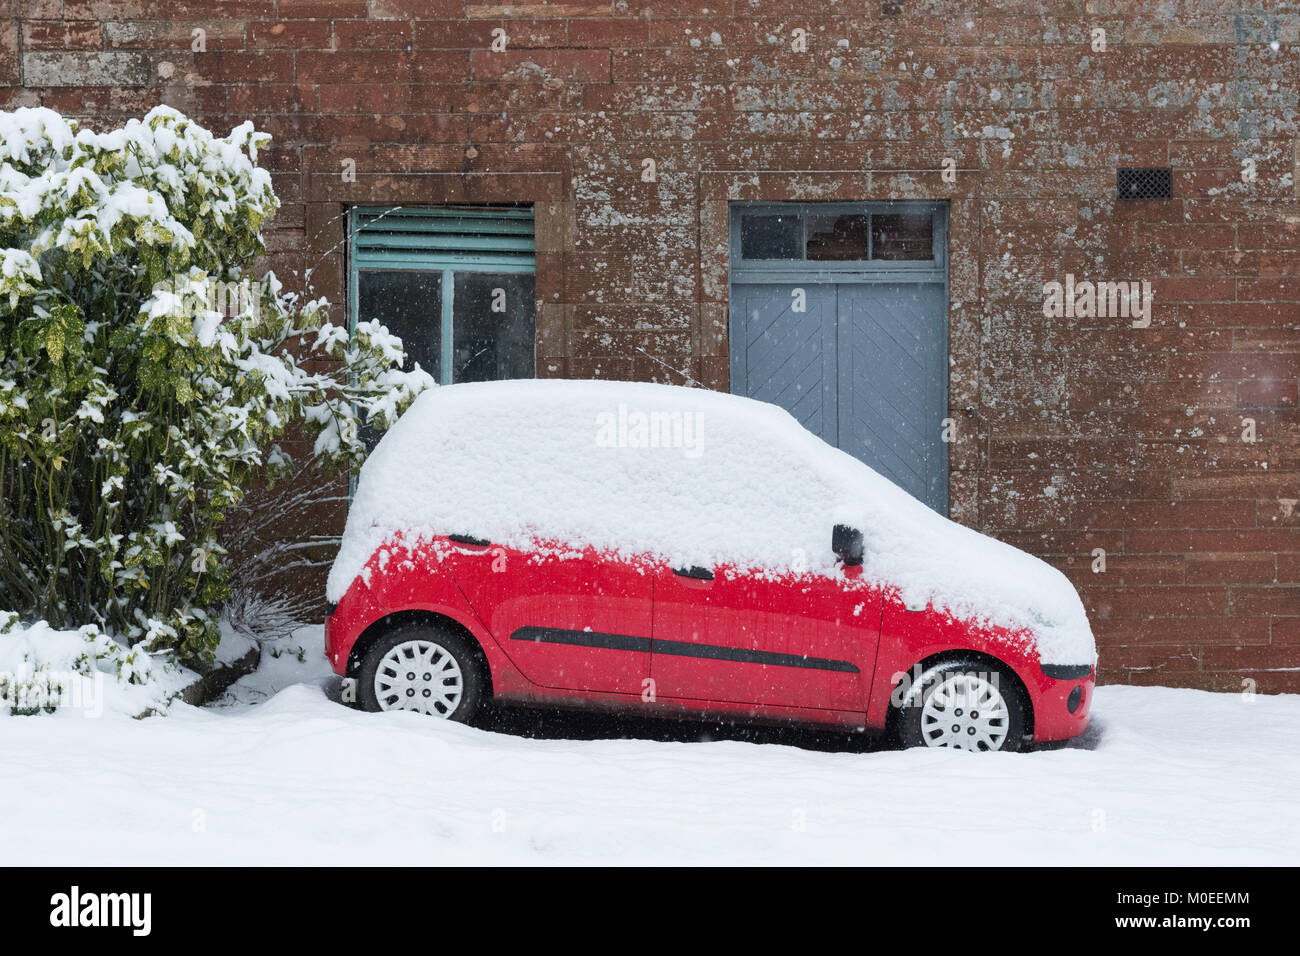 Killearn, Stirlingshire, Scotland, UK - 21 janvier 2018: UK - les fortes chutes de neige dans le Stirlingshire village de Killearn Crédit: Kay Roxby/Alamy Live News Banque D'Images